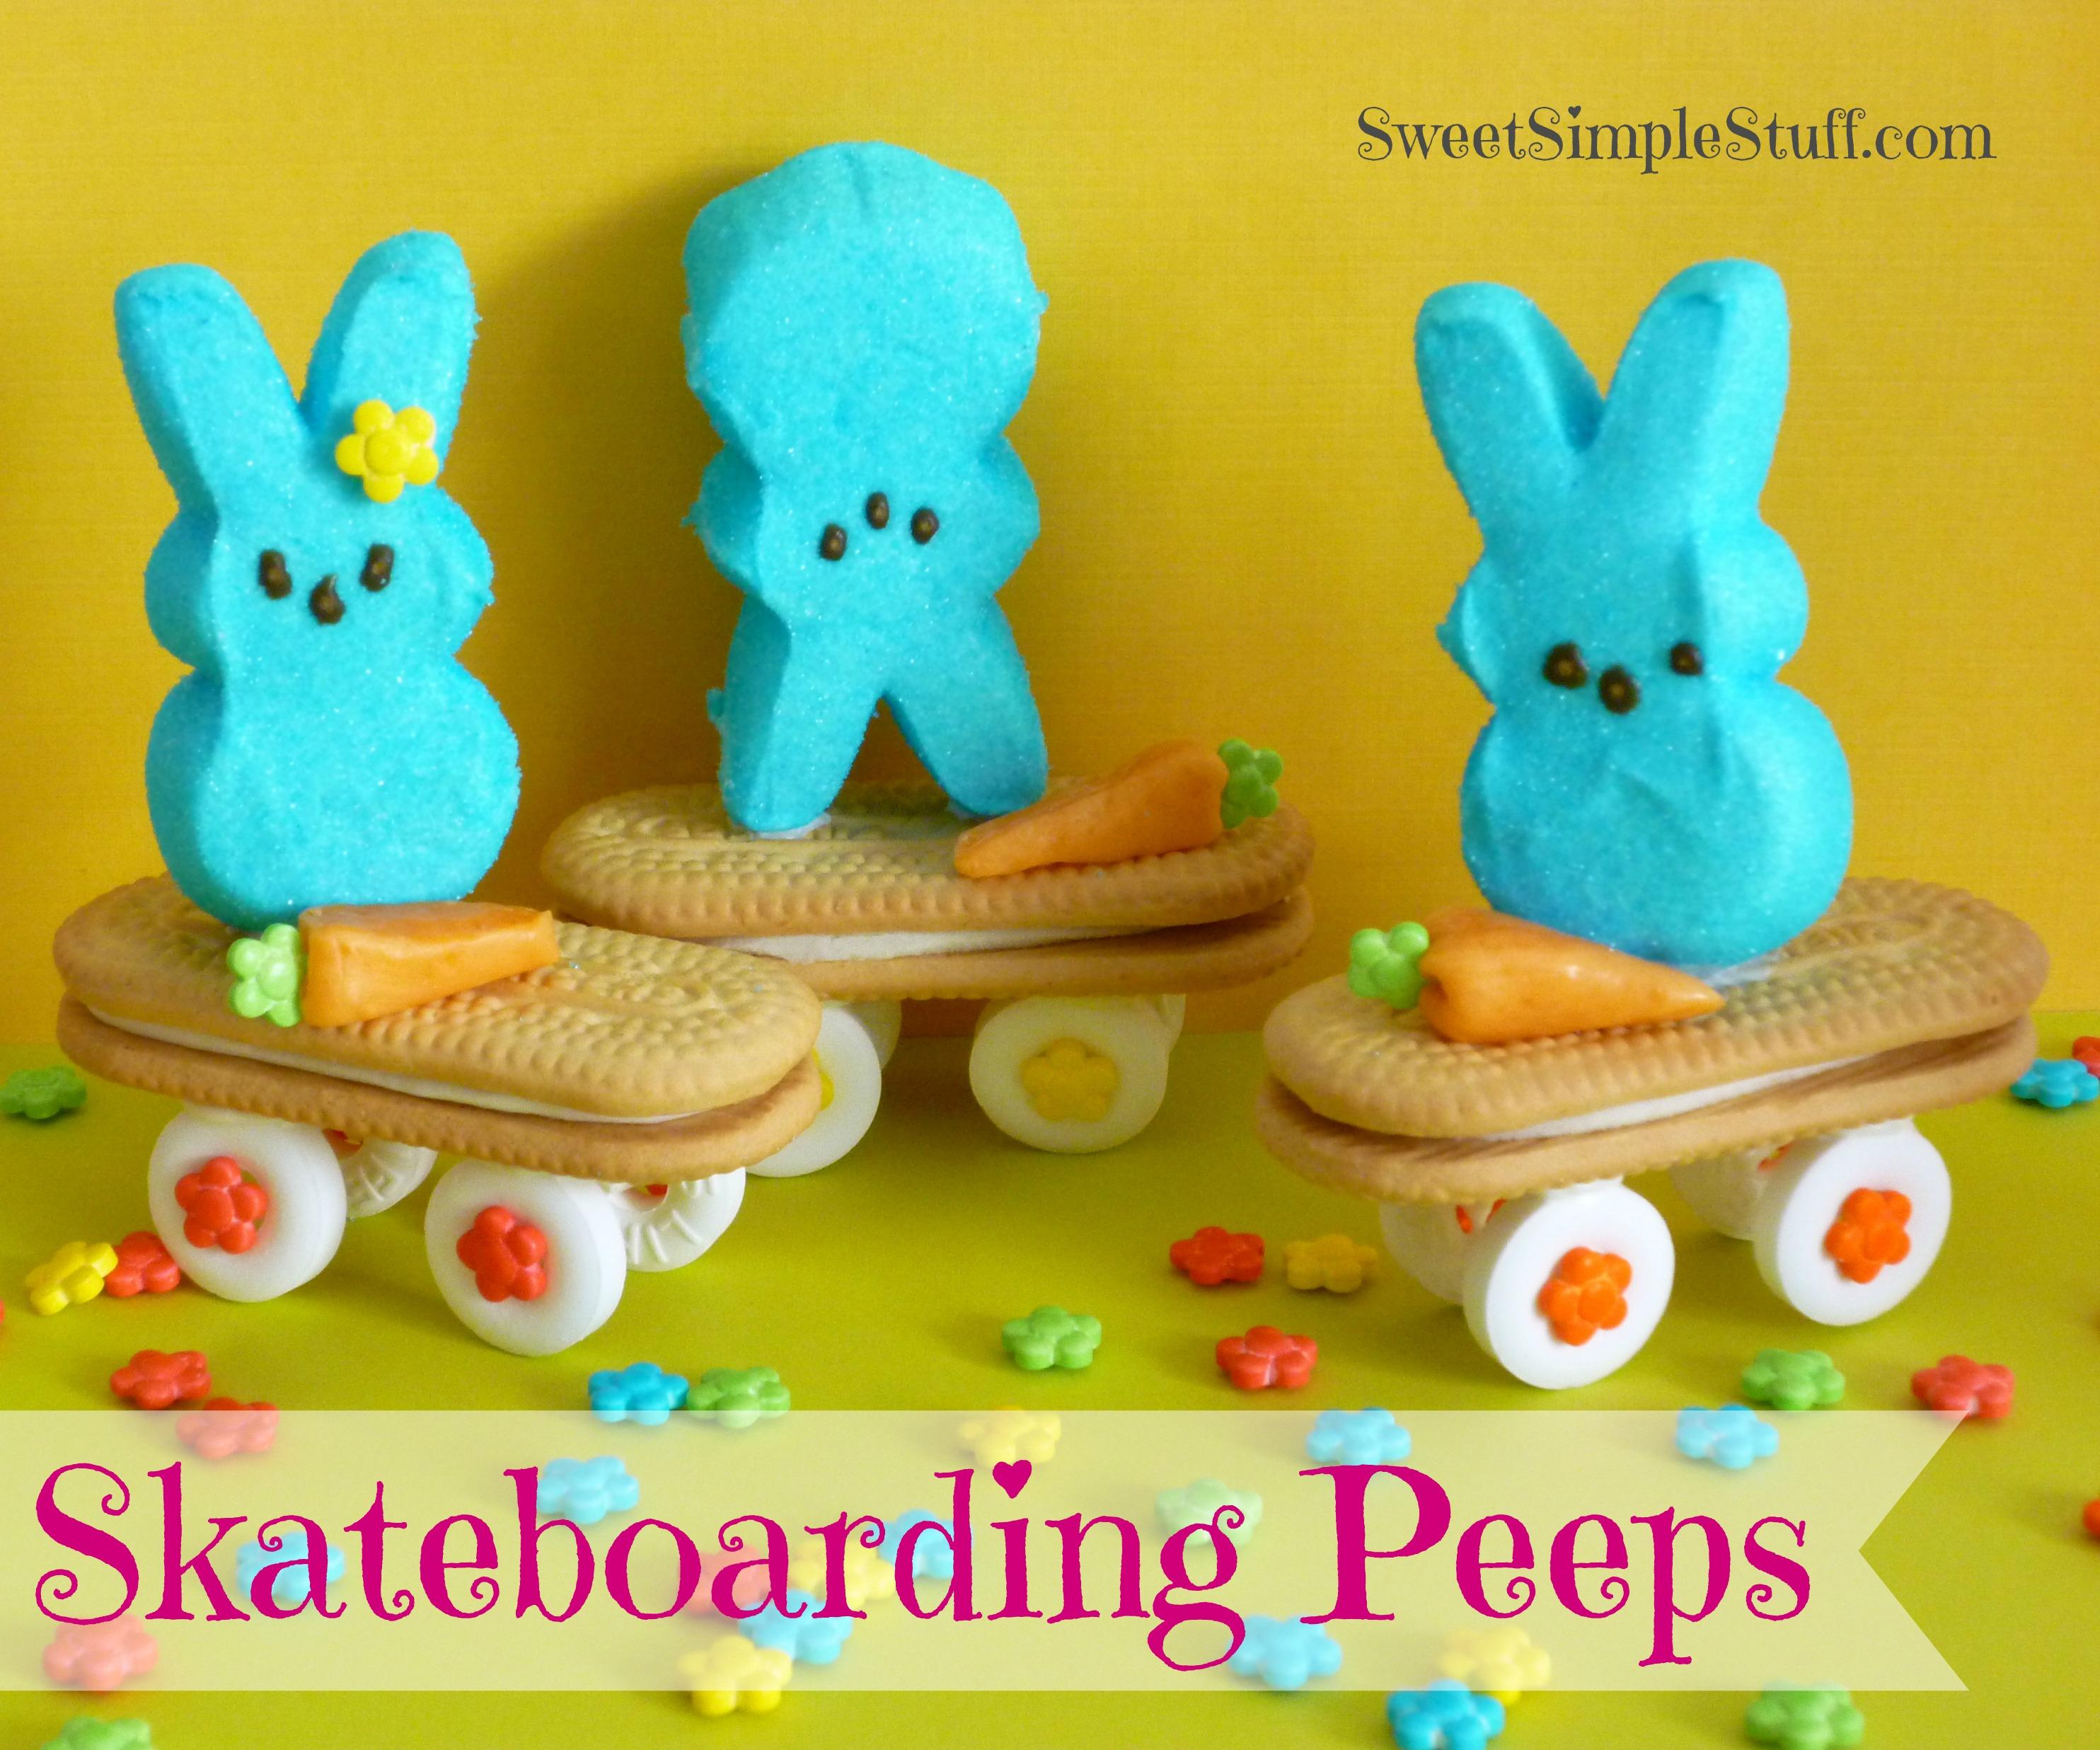 Skateboarding bunnies peeps sweet simple stuff peeps on skateboards solutioingenieria Images